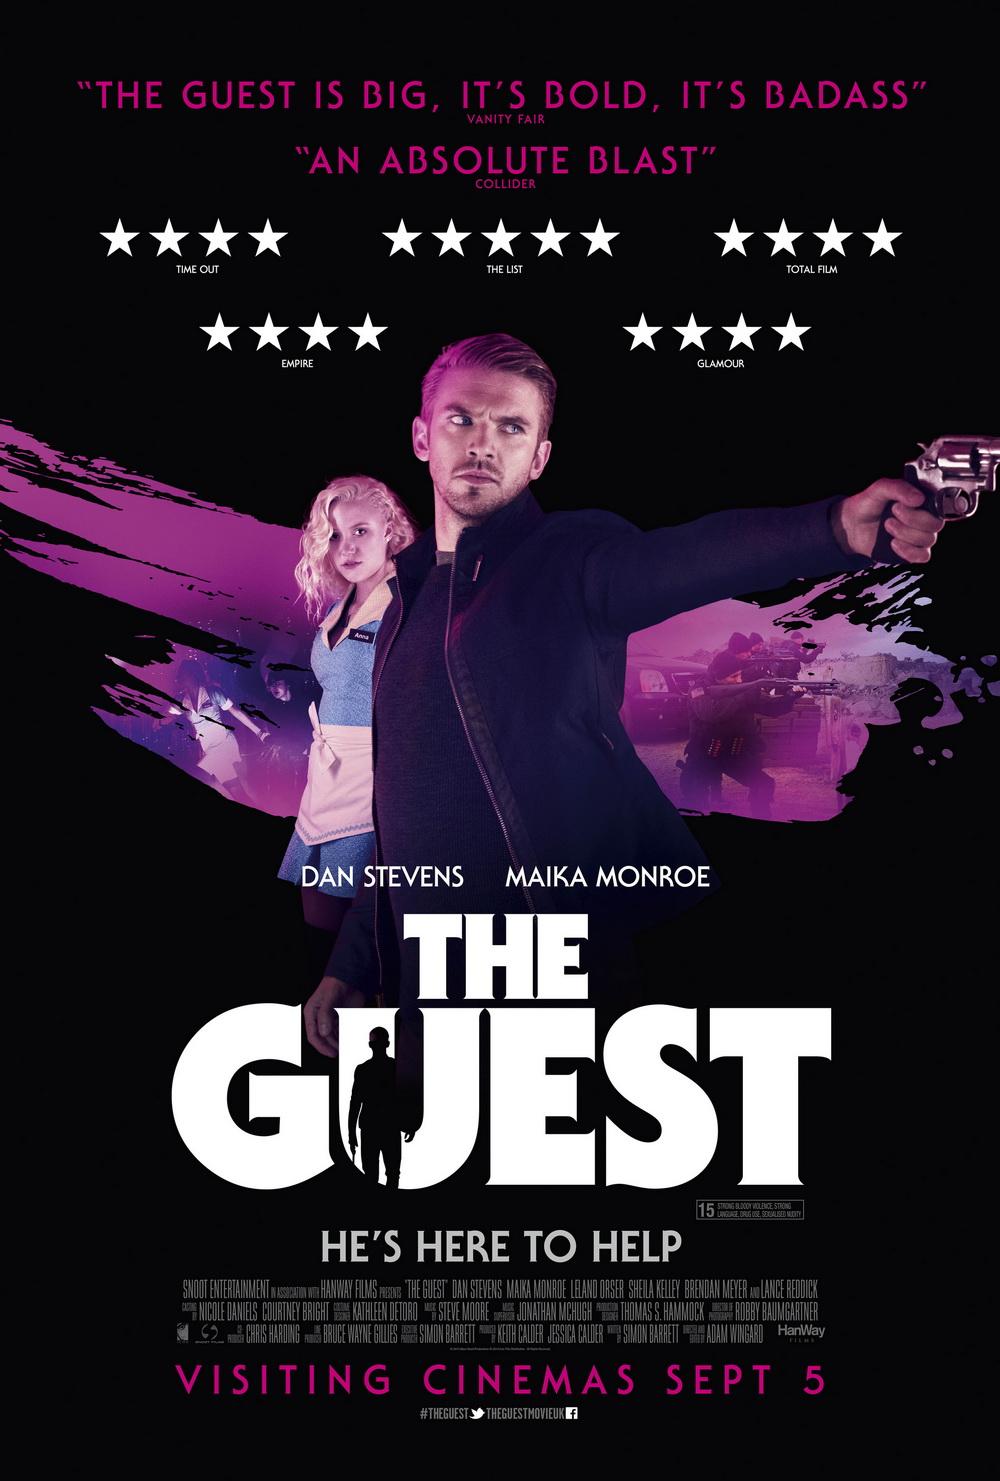 the_guest_main_one_sheet.jpg